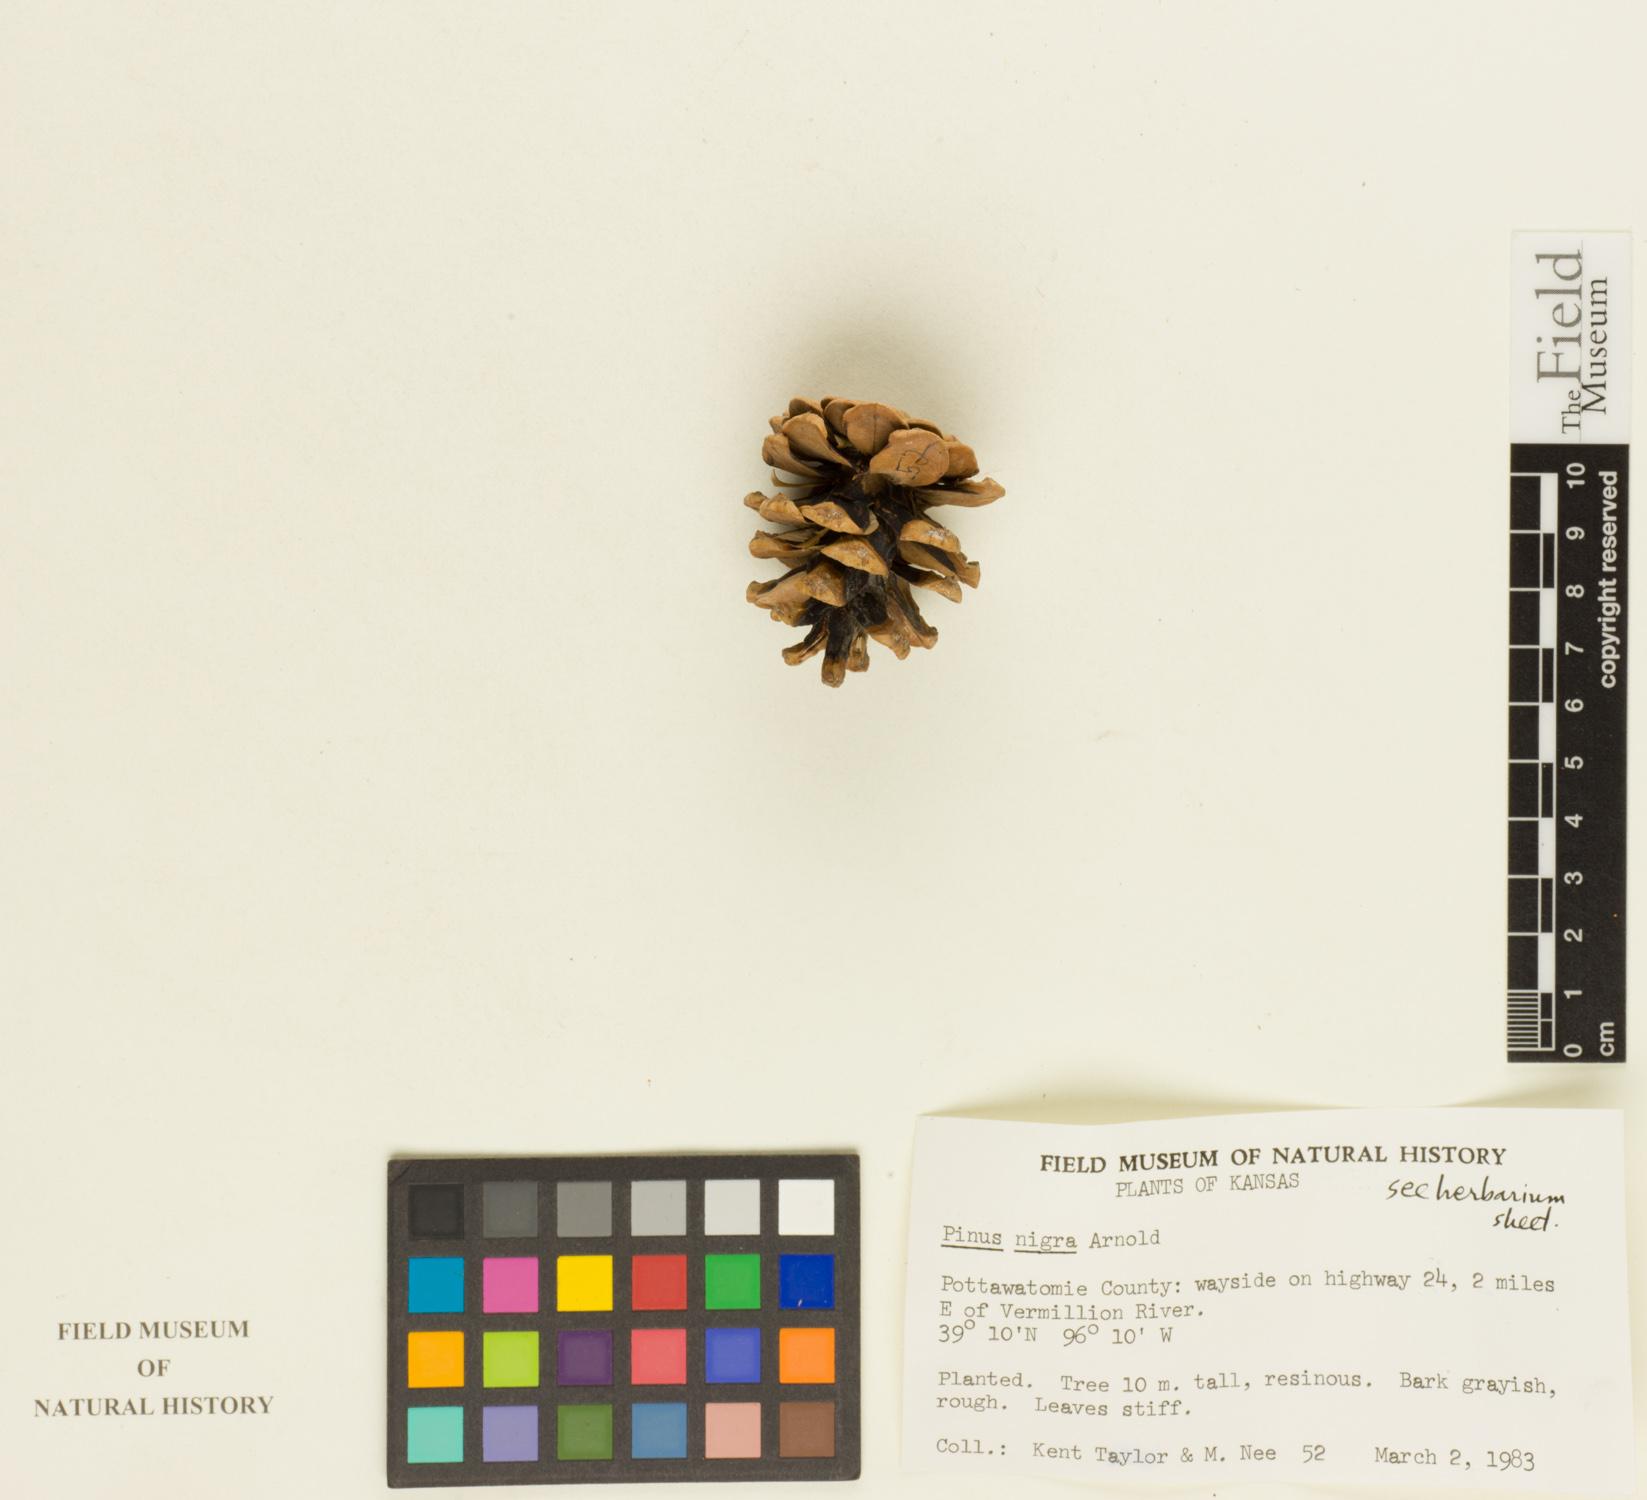 Pinus nigra image